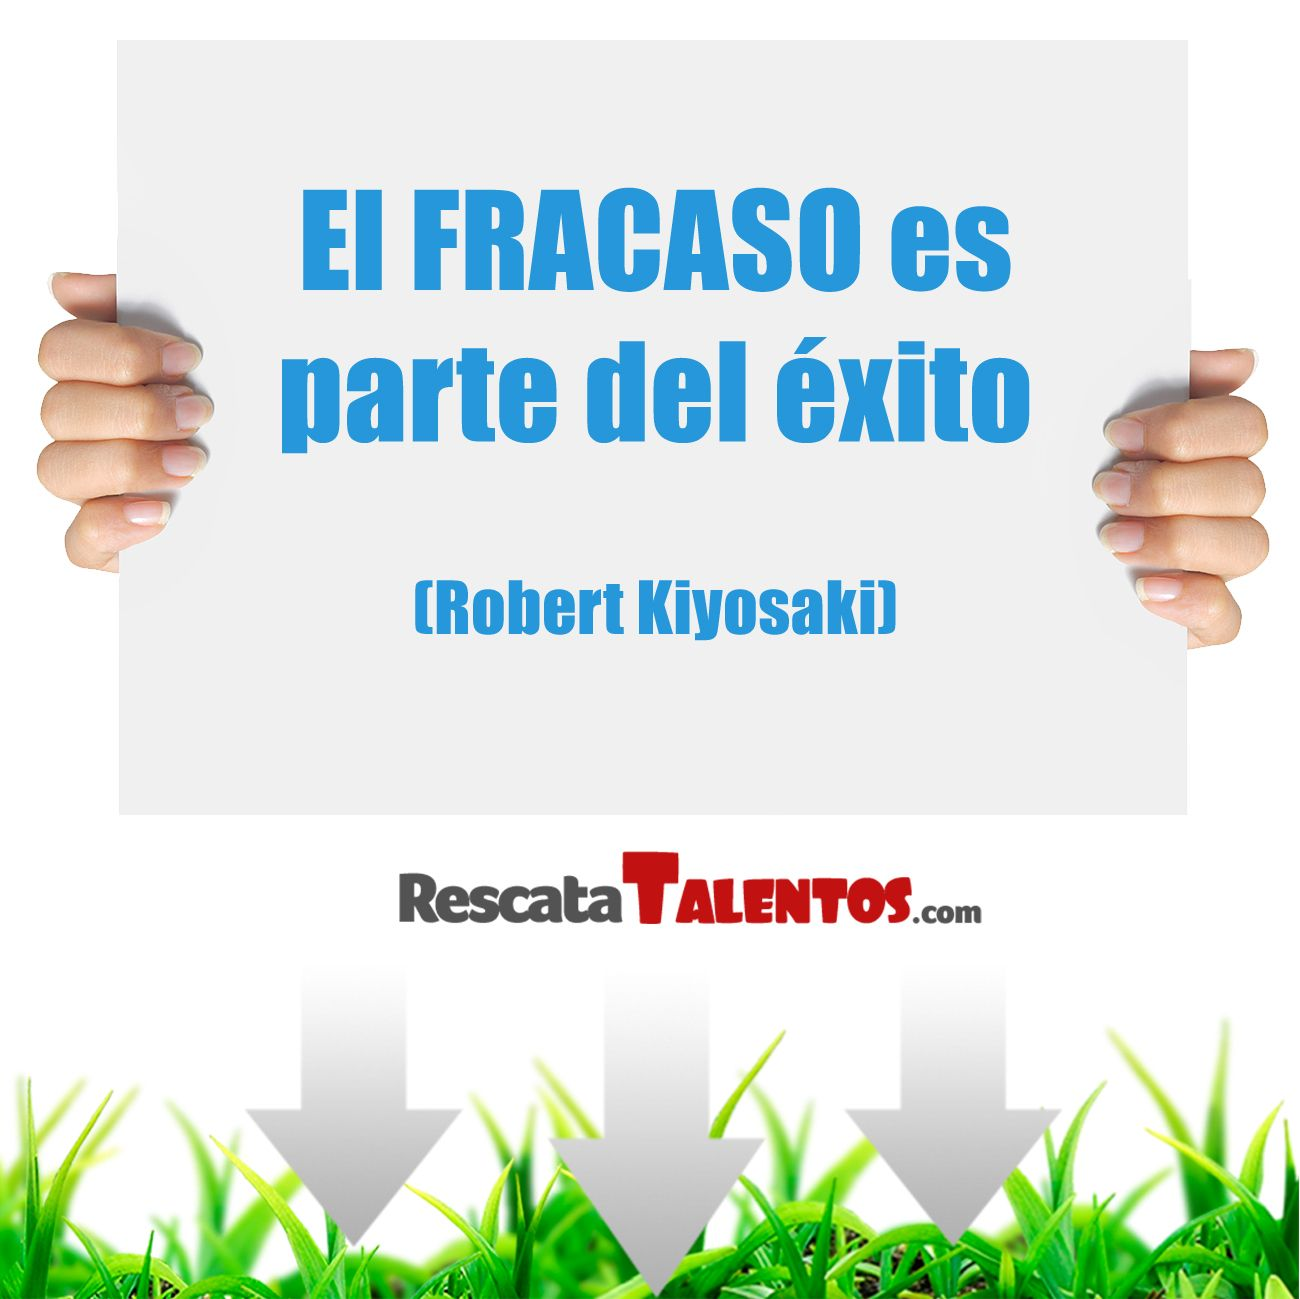 Fracaso es parte del Éxito (Kiyosaki) ✔ http://bit.ly/1fky2Ft http://RescataTalentos.com  http://socialmedia.rescatatalentos.com/wp-content/uploads/2013/11/El-FRACASO-es-parte-del-éxito-Robert-Kiyosaki-1024x1024.jpg